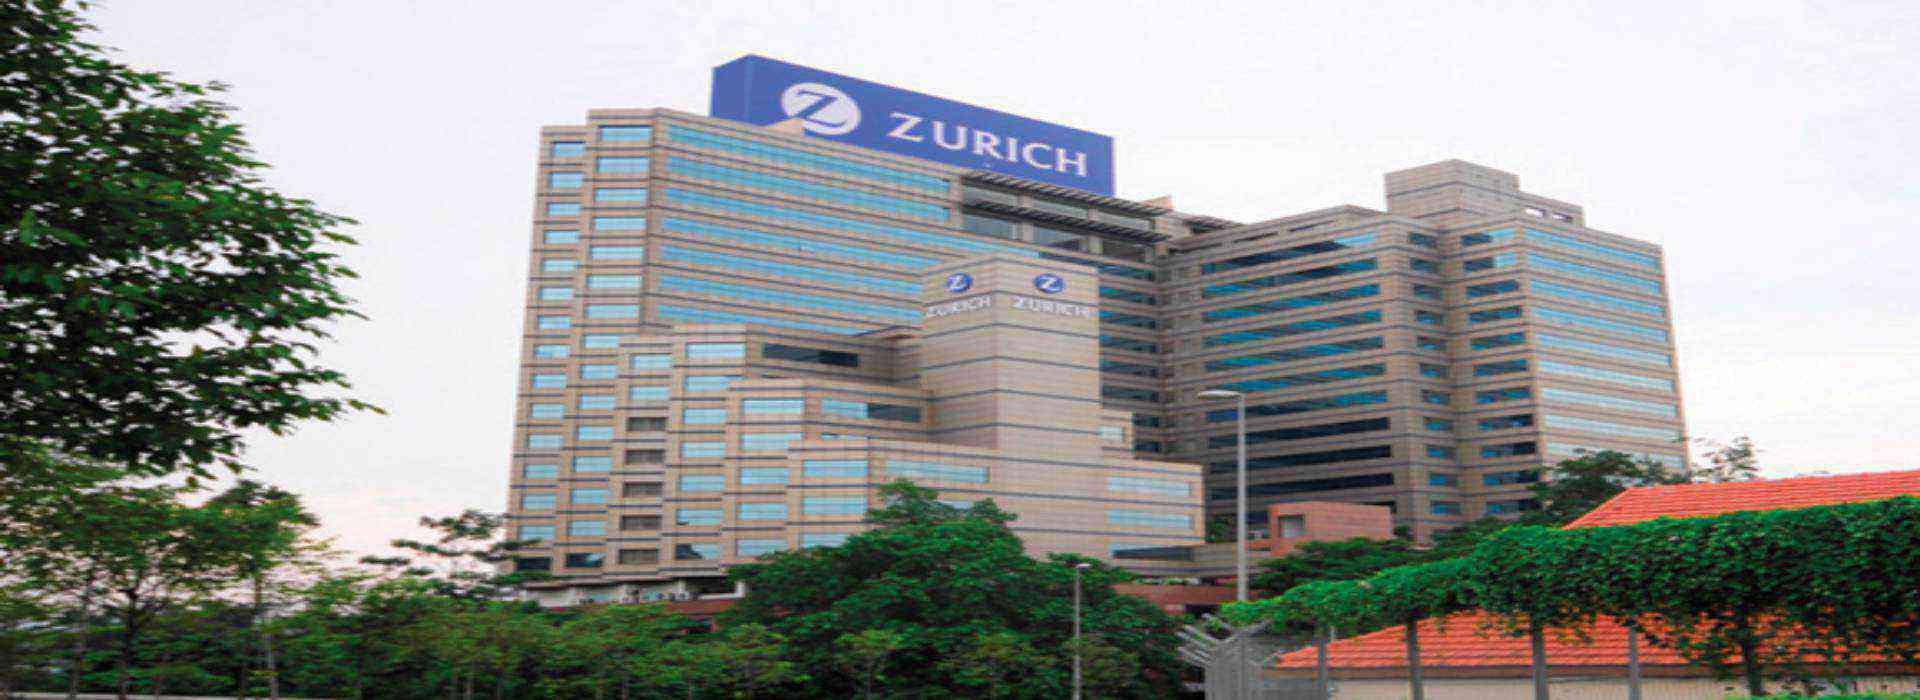 Zurich Malaysia Contact Details Head Office Address Customerservicedirectory